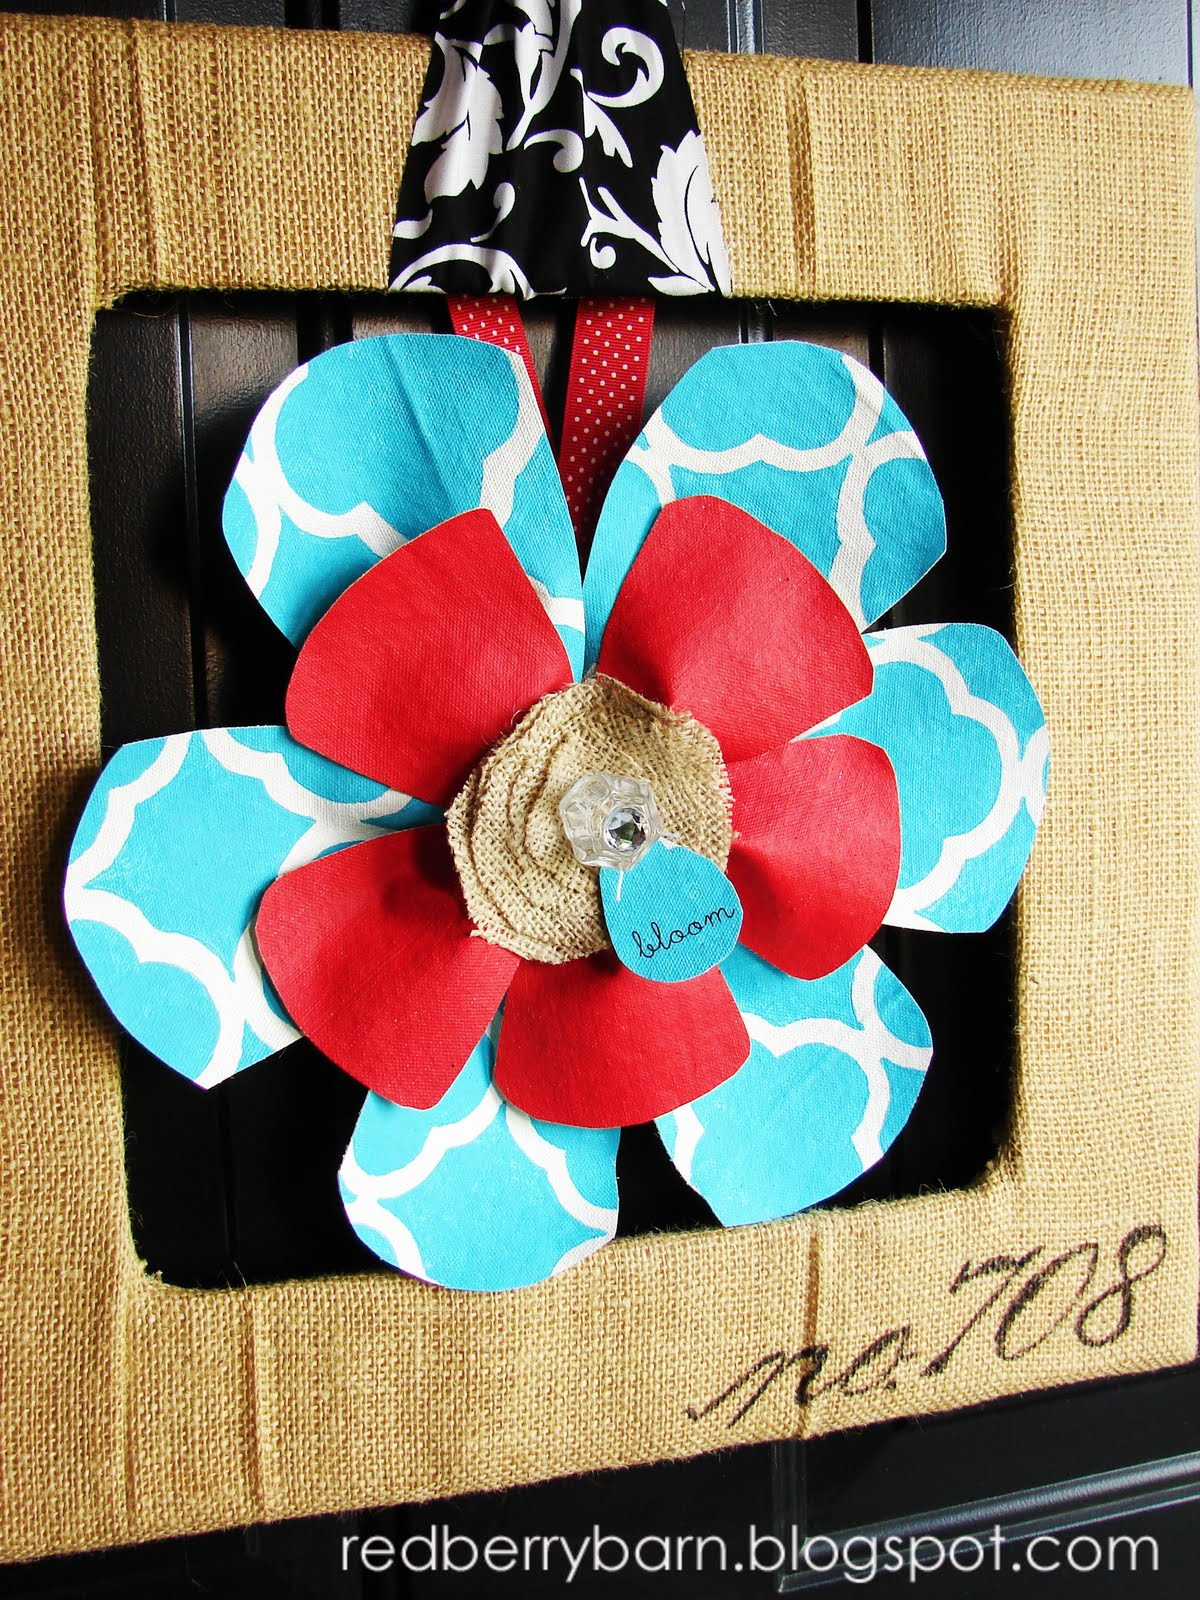 https://i2.wp.com/2.bp.blogspot.com/_5R1cHzQOAsI/S_2nSUBda0I/AAAAAAAADxI/4Tv4kJyWpkg/s1600/flower+side.jpg?resize=419%2C559